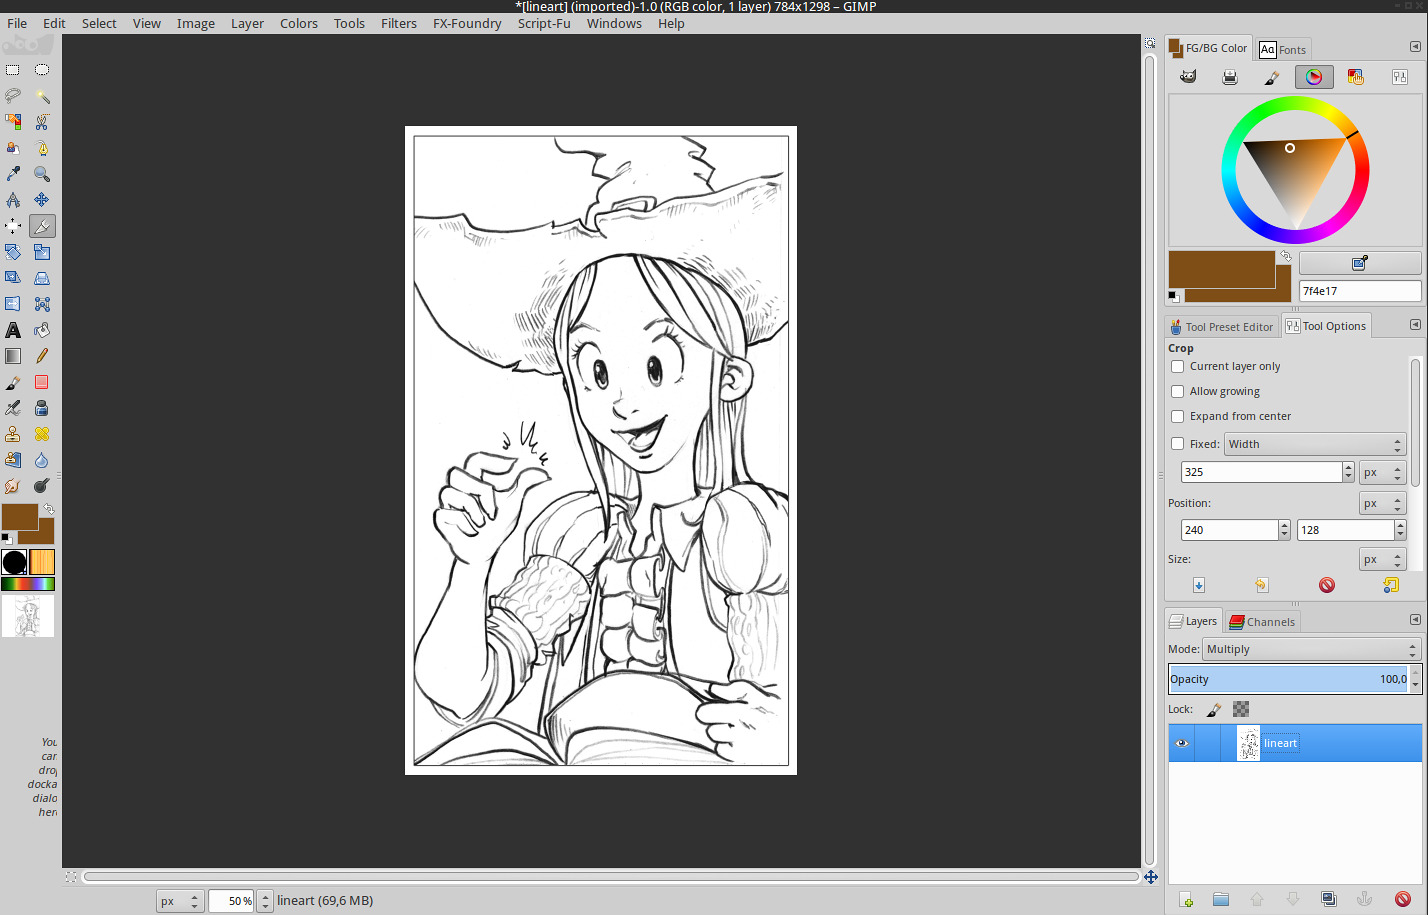 Line Art Gimp : Gmic line art colorization david revoy